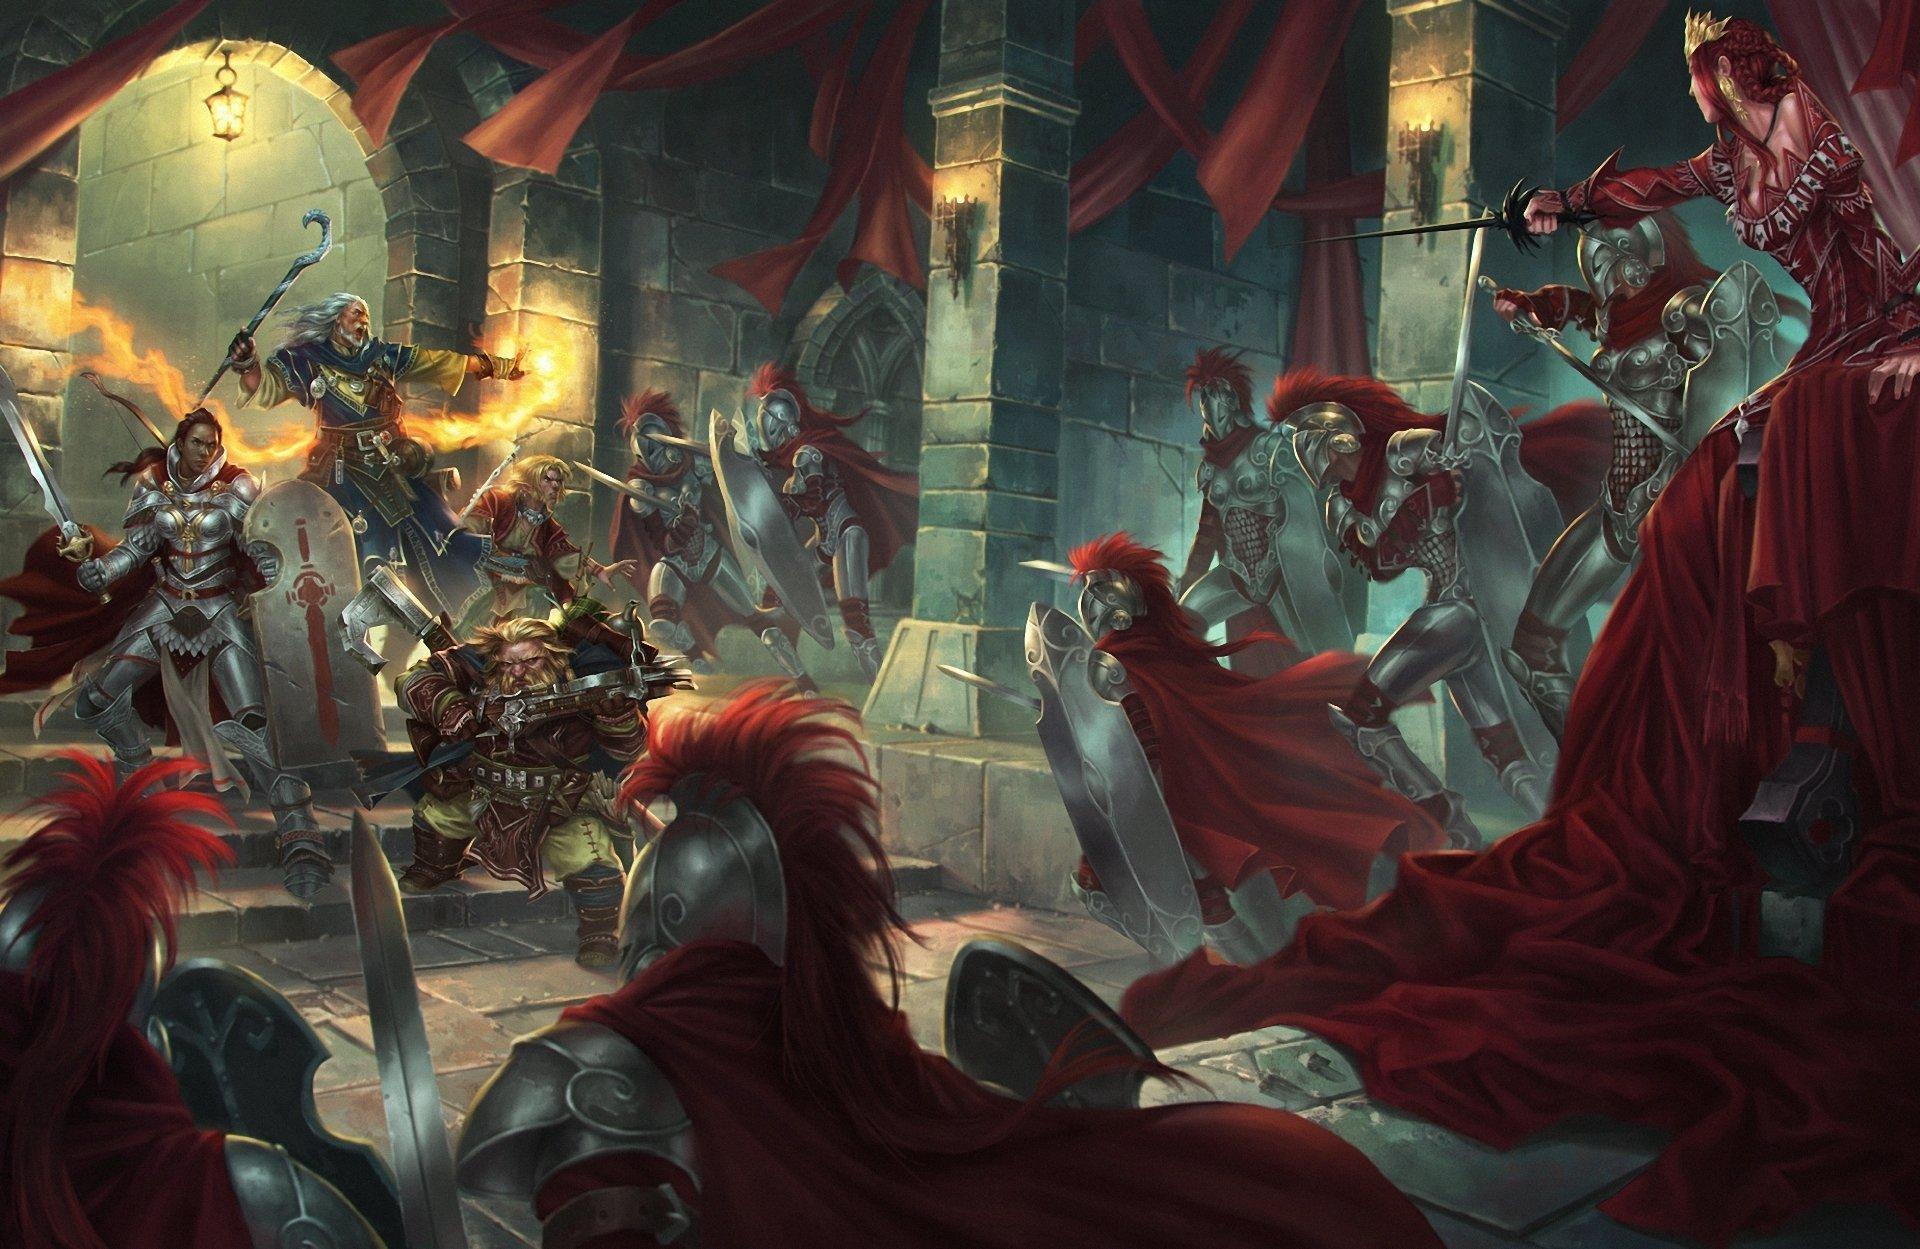 wizard battle wallpaper - photo #30